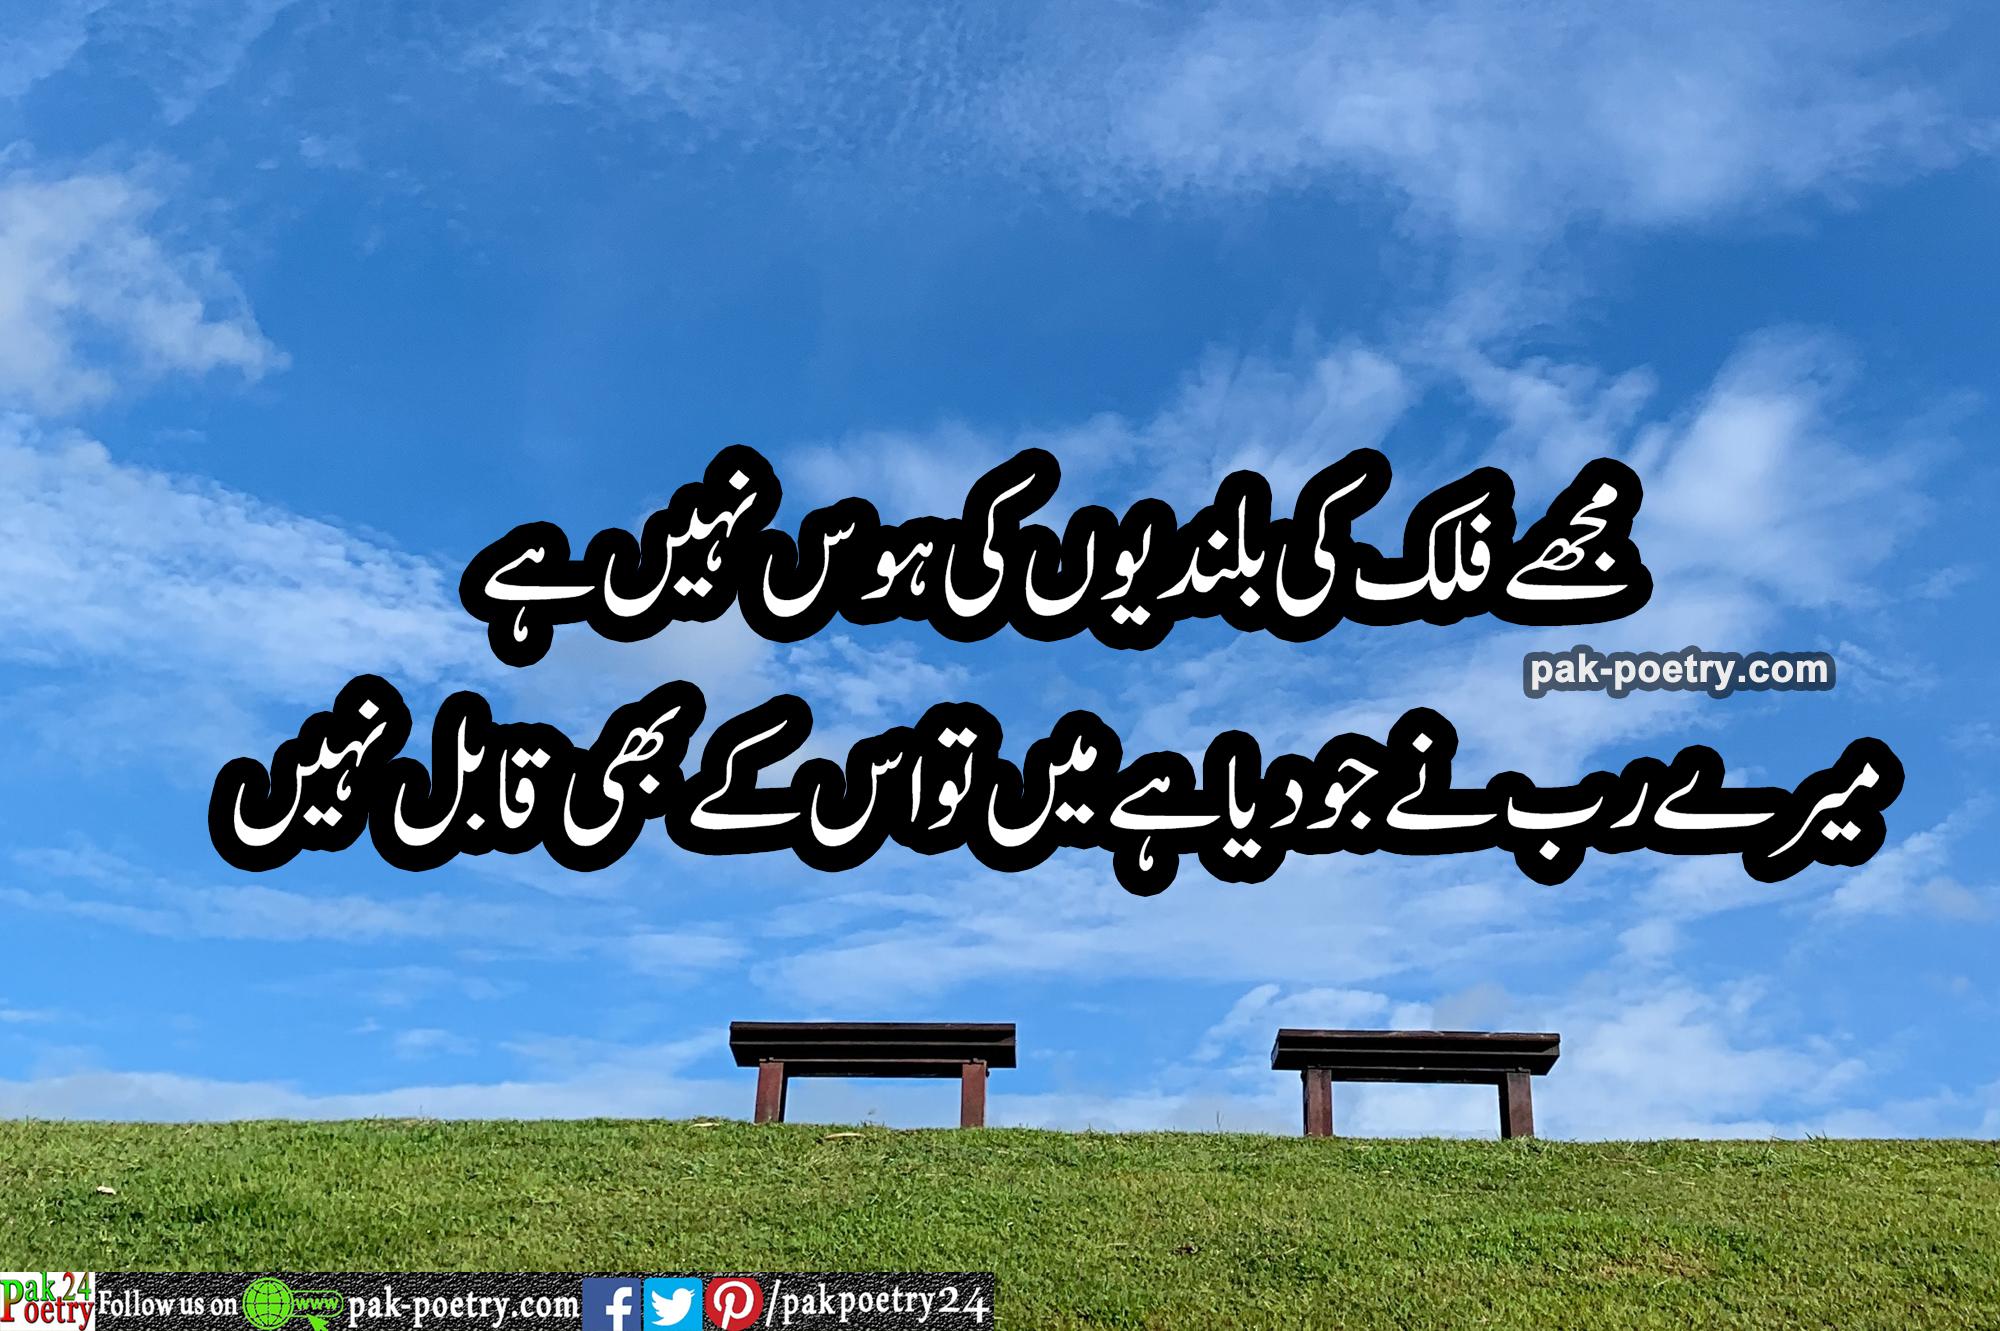 Islamic poetry, Islamic images, Islamic poetry in urdu, Poetry Islamic, urdu Islamic poetry, allah Islamic poetry, Islamic poetry pics, Islamic poetry urdu, Islamic photos, dua Islamic poetry, Poetry in urdu, urdu poetry, poetry urdu,